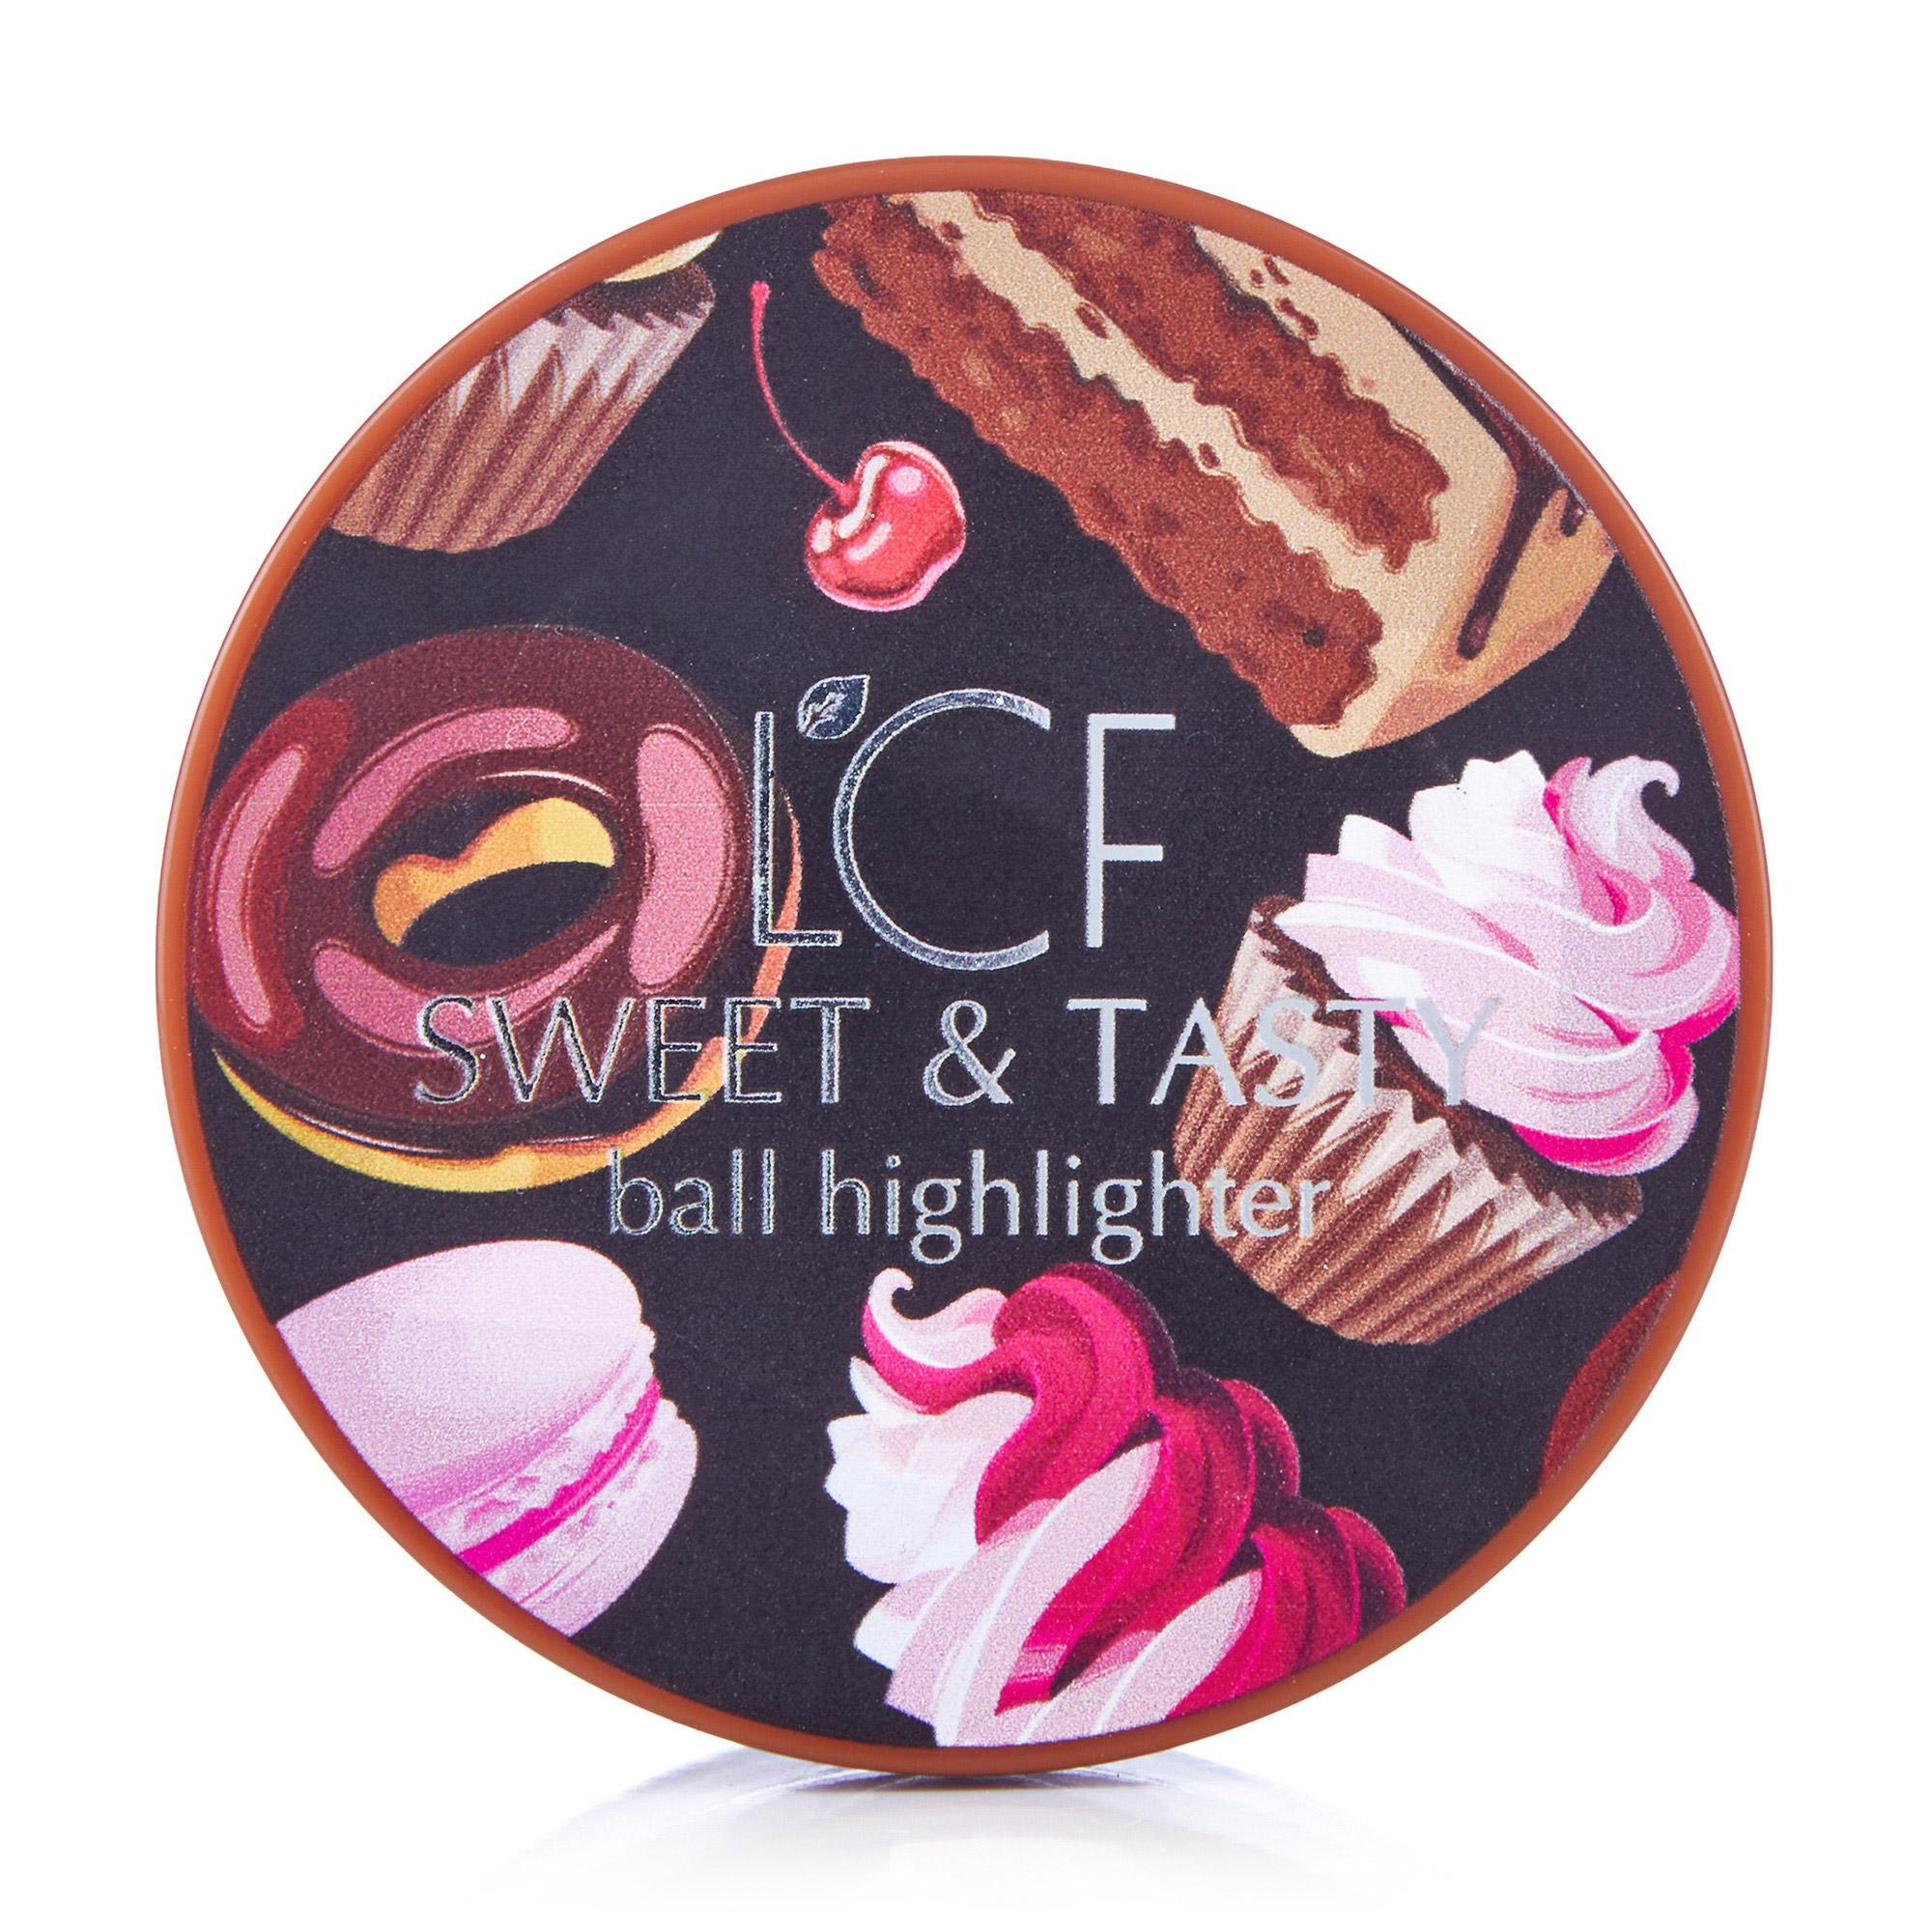 Хайлайтер кульковий LCF Sweet and Tasty Тон 1, 16 г